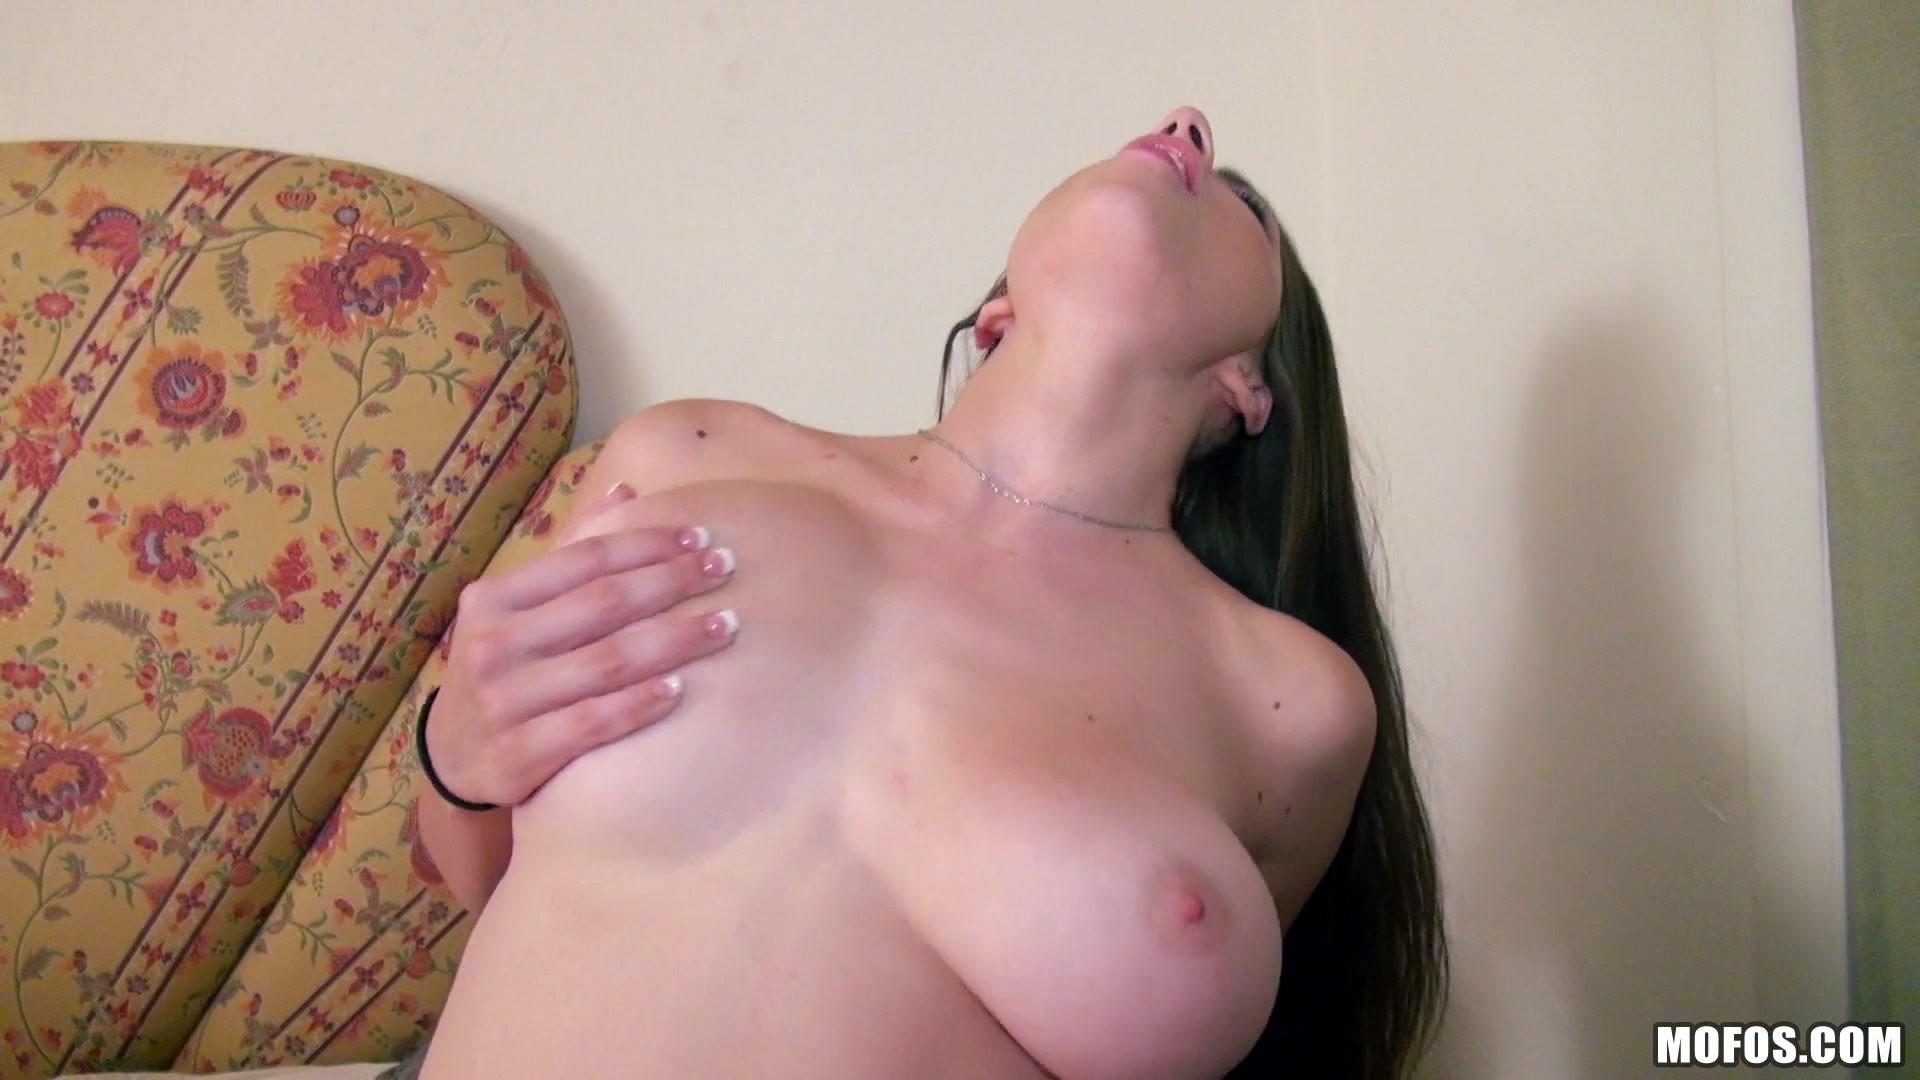 https://caps1cdn.adultempire.com/o/2437/3840/1711707_06620_3840c.jpg